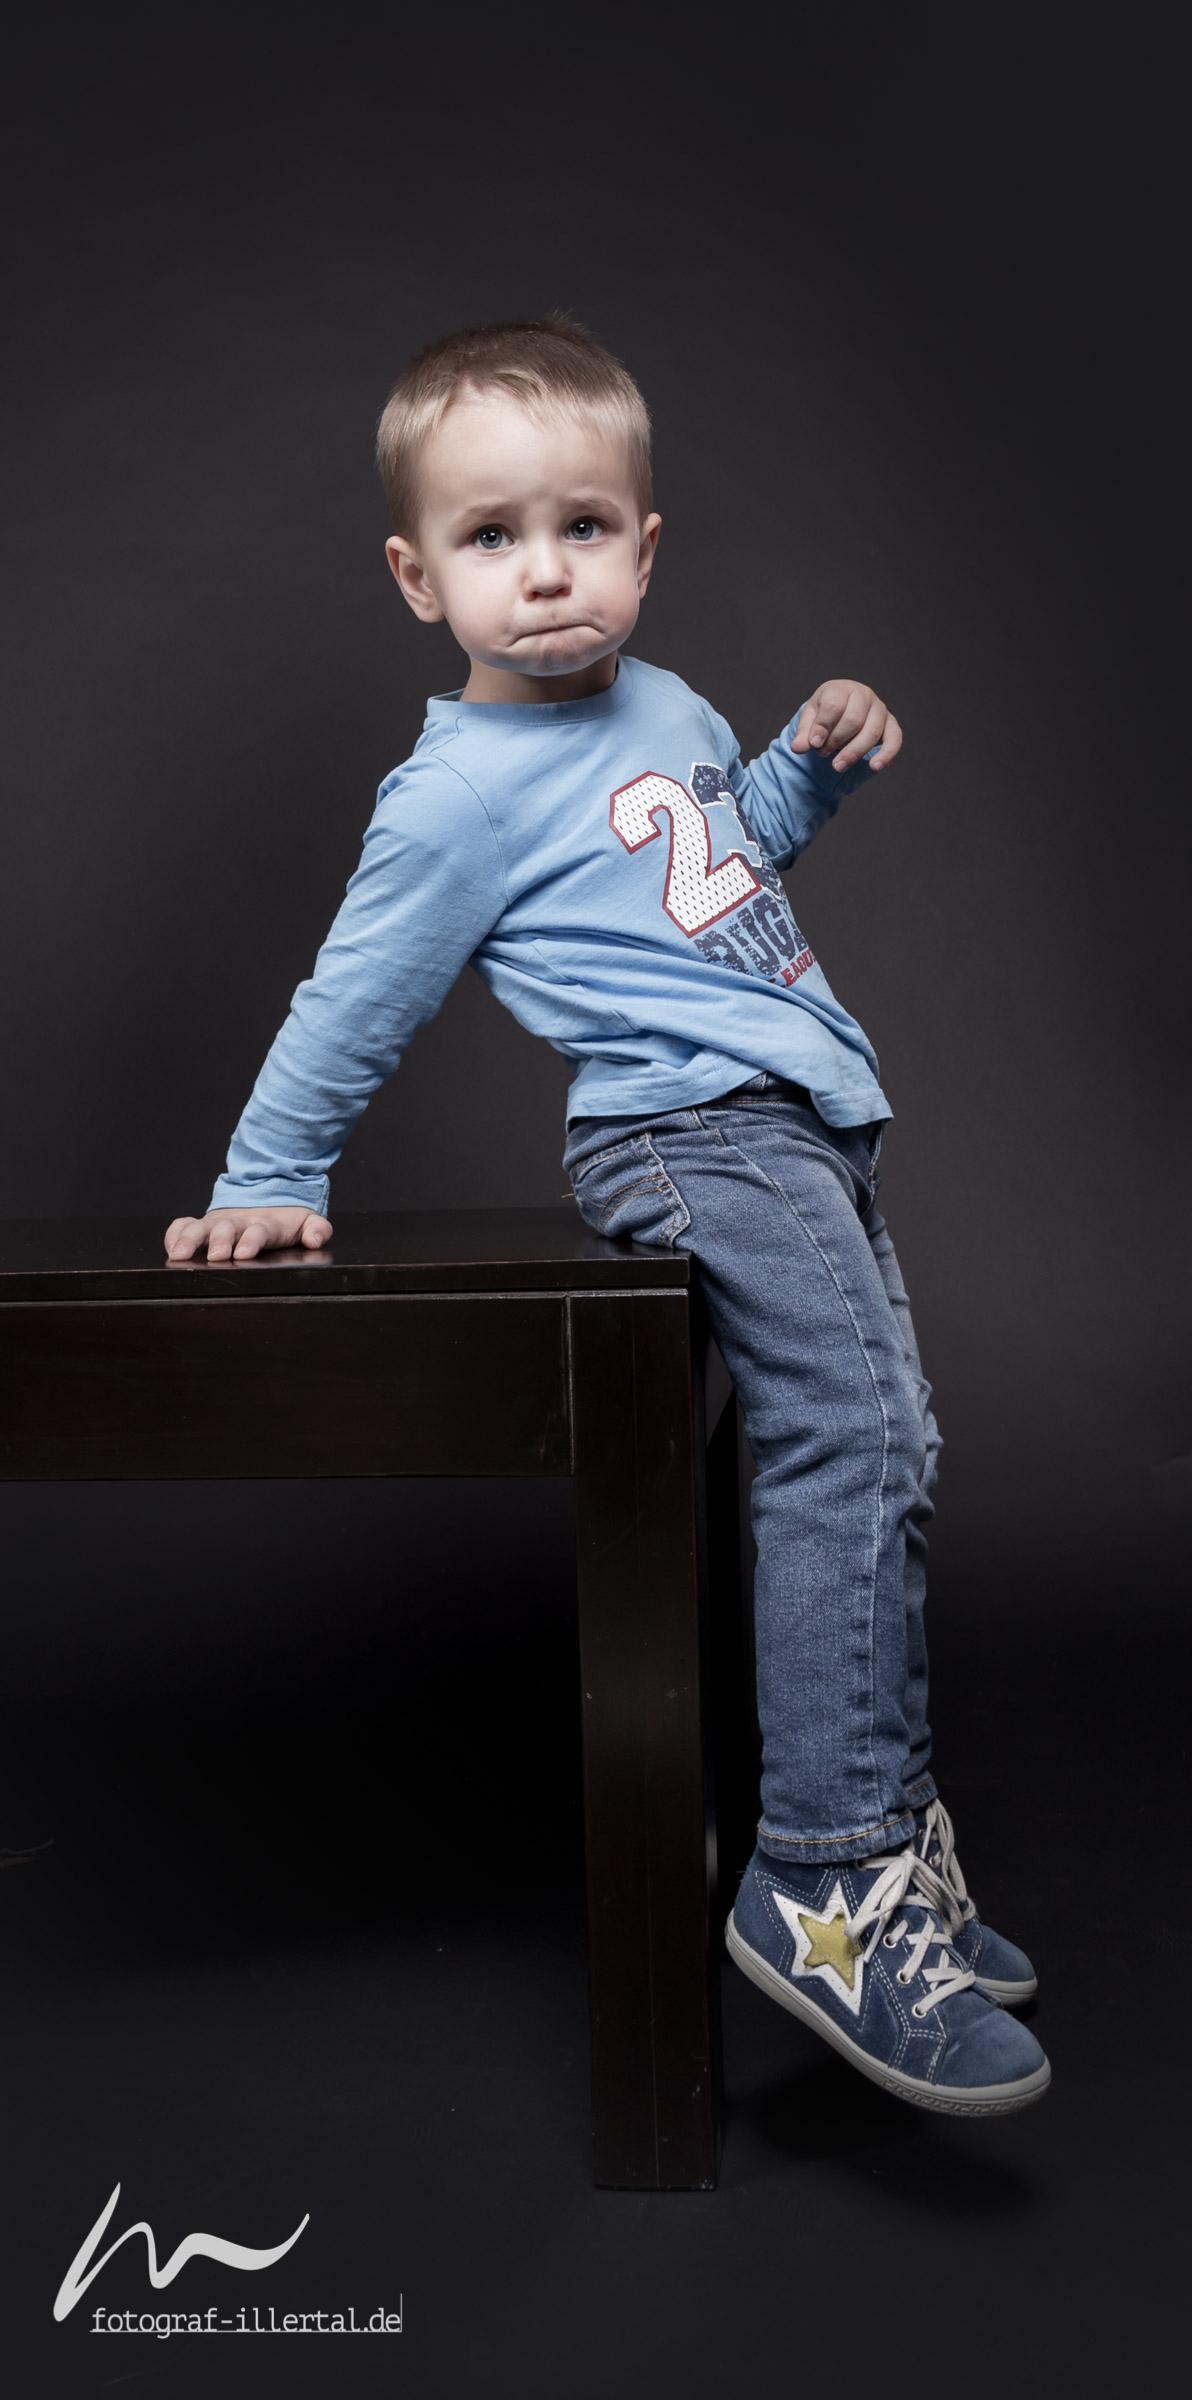 Fotograf Illertal-Christian Miller-Kinderfotos-Familienfotos-_MG_7281-Bearbeitet